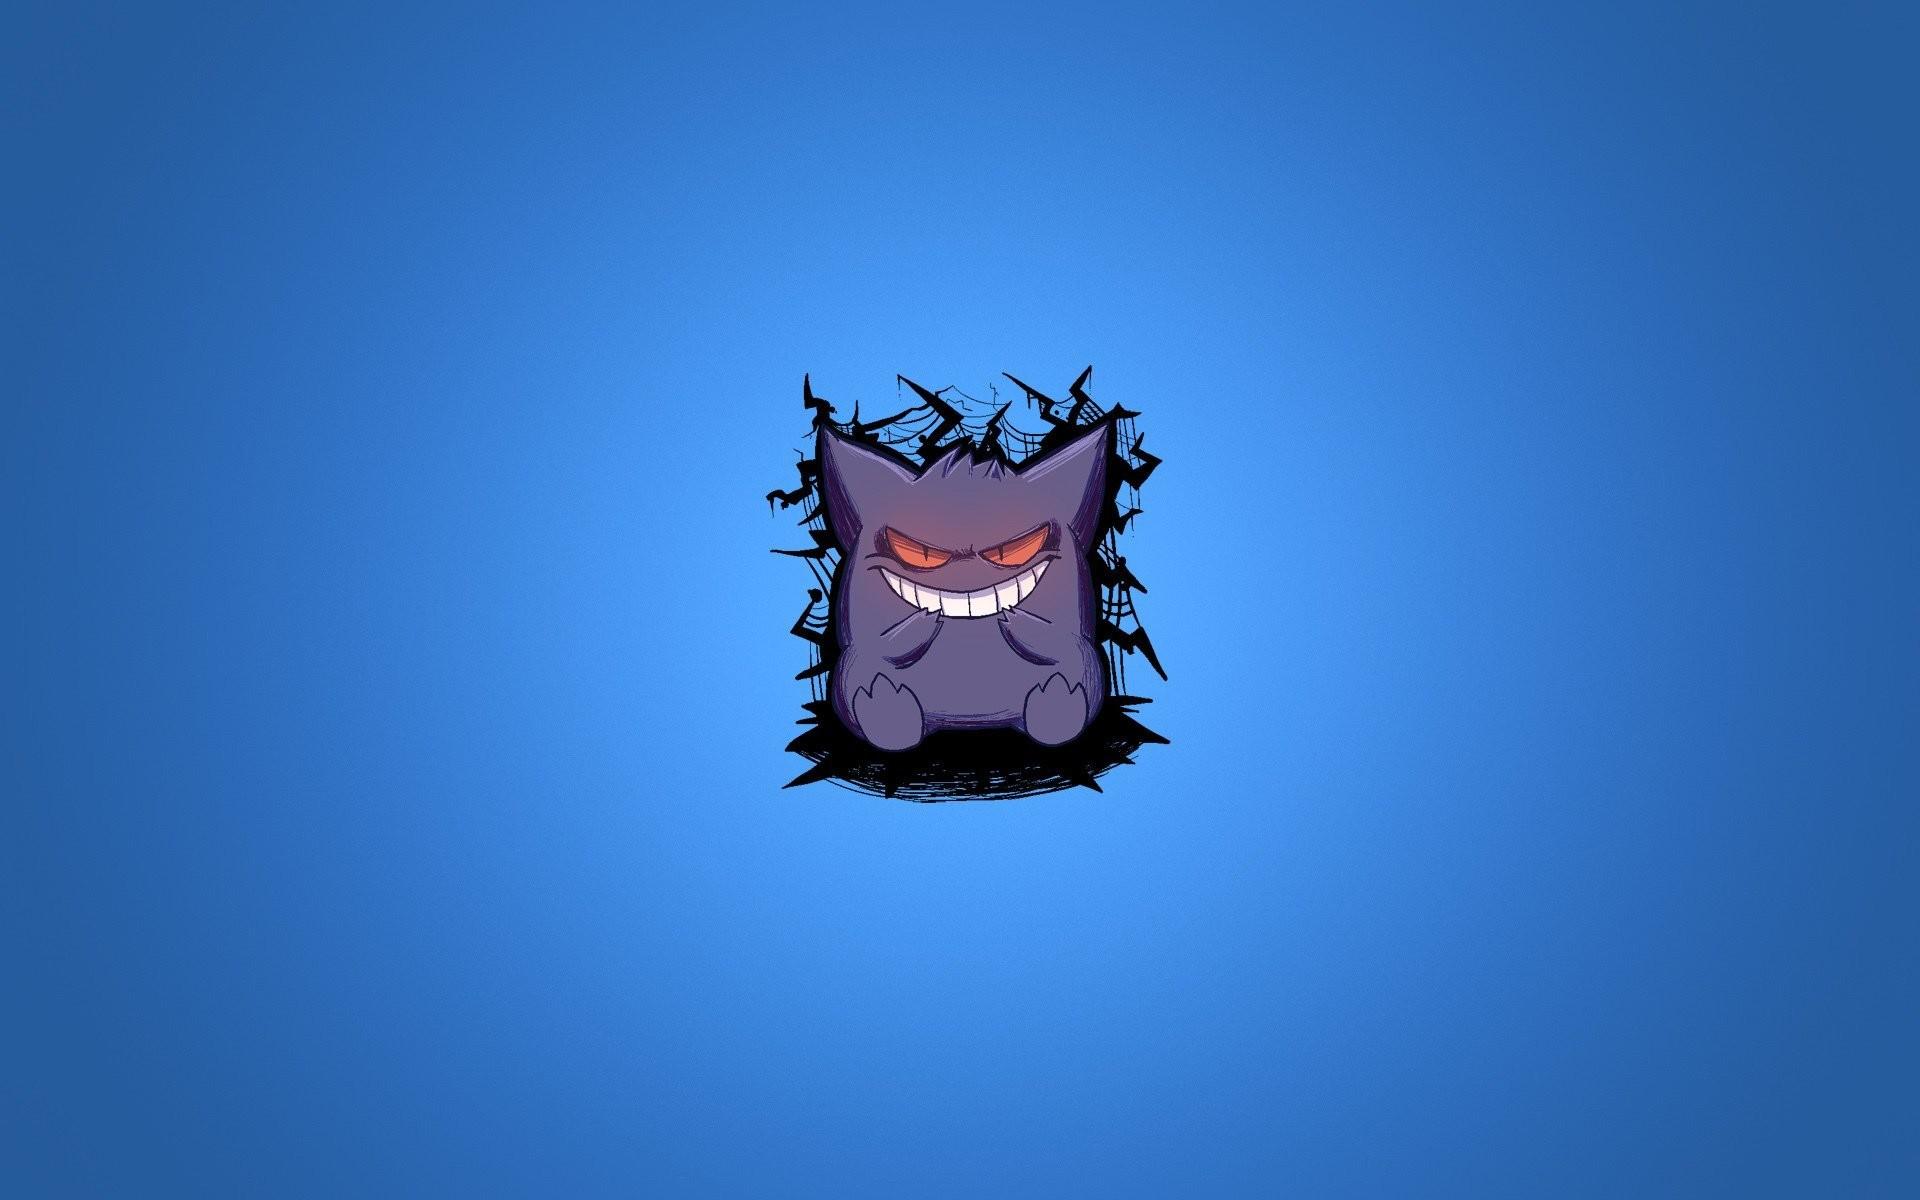 pokemon pokemon gengar blue background purple smile minimalism